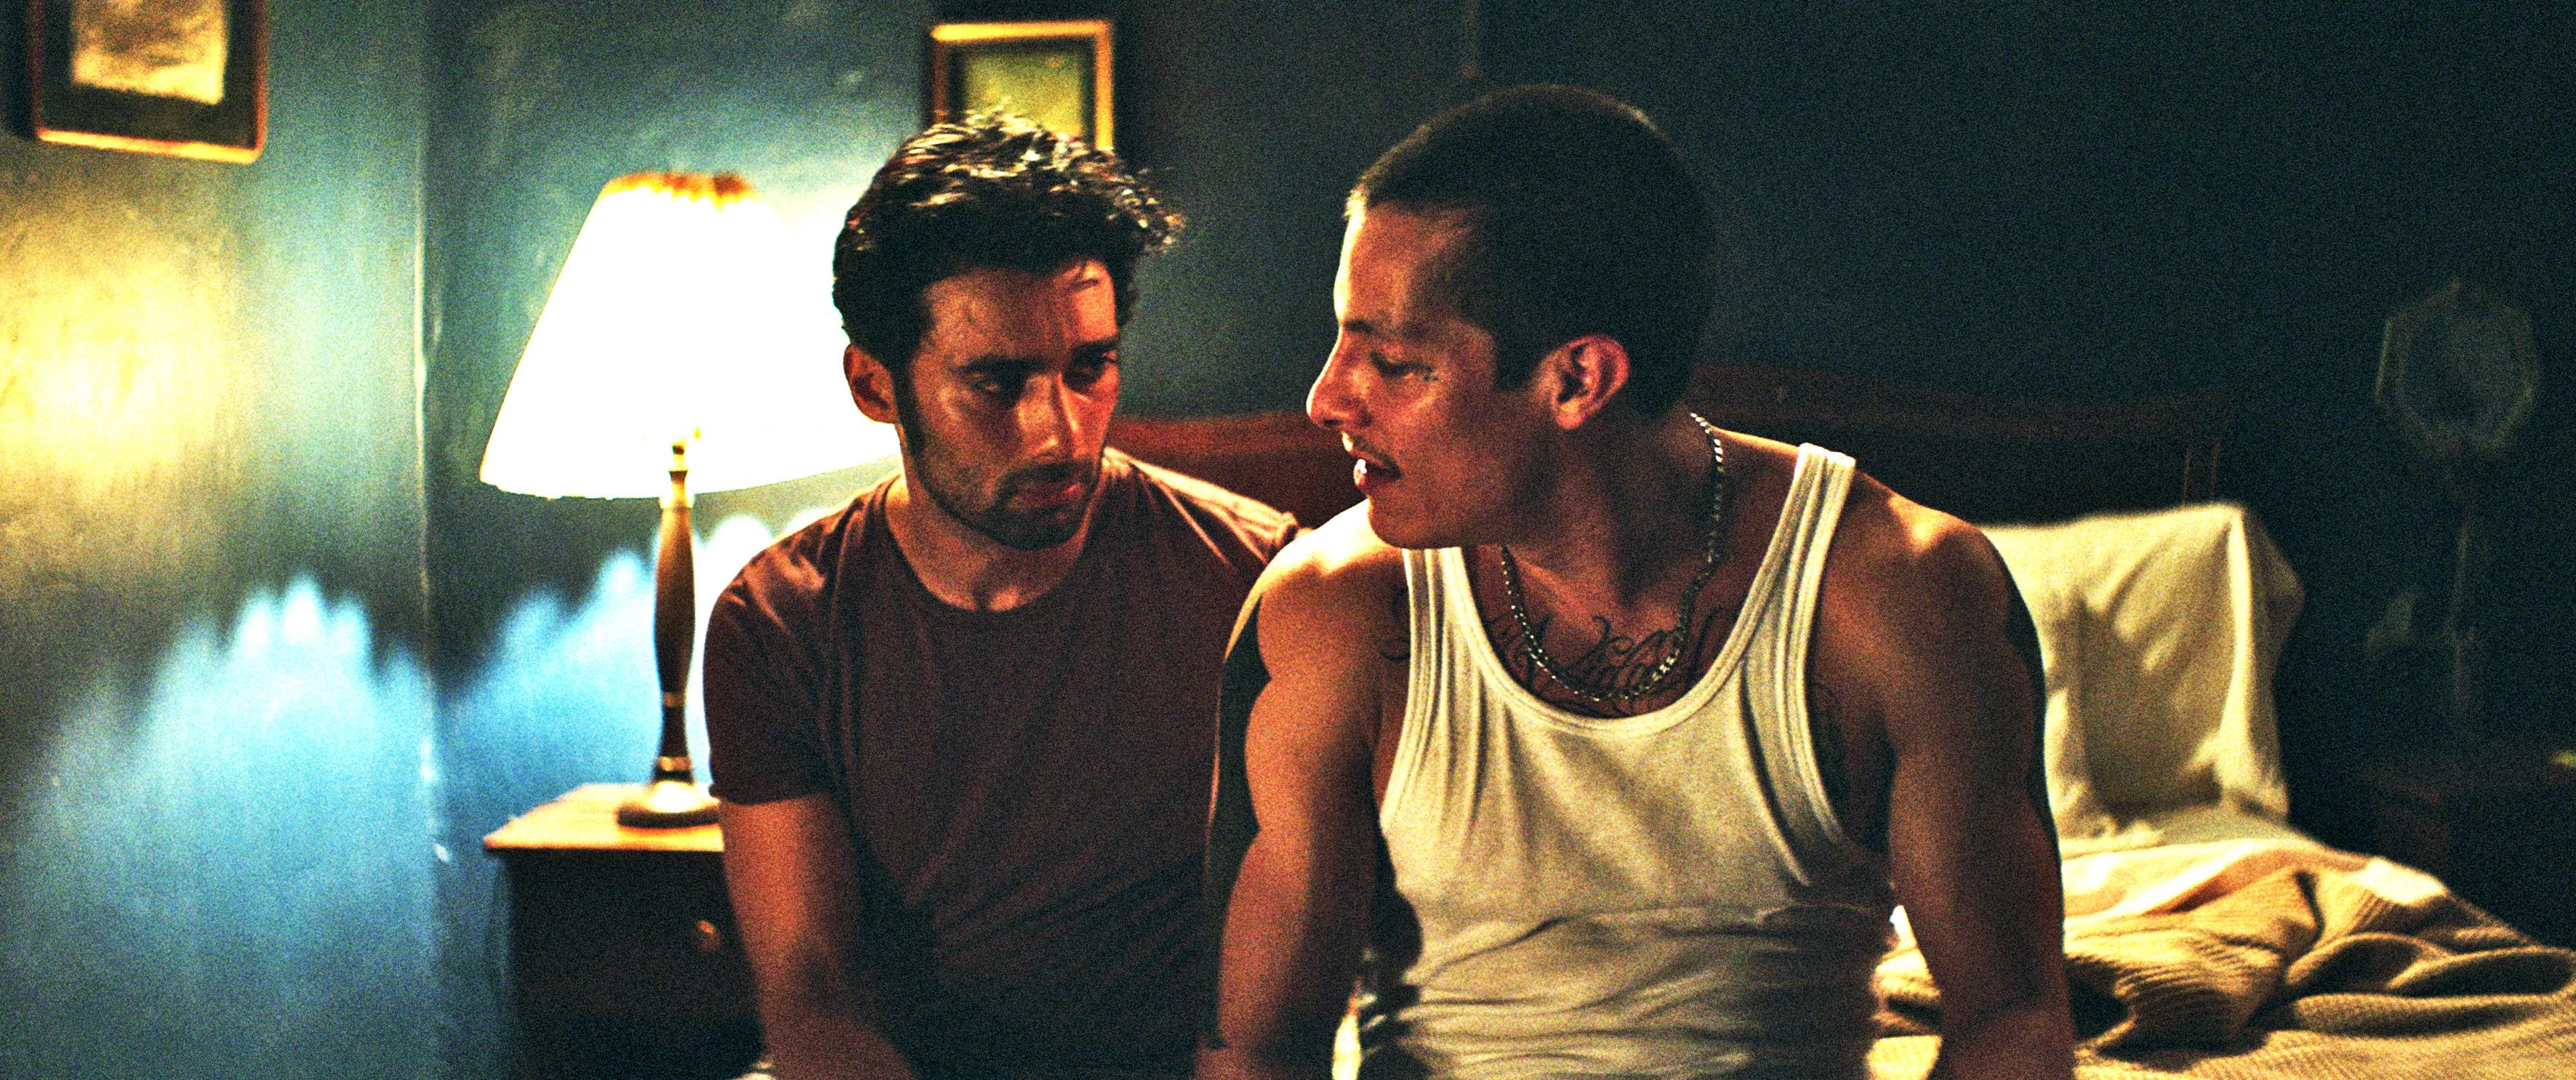 Lucièrnagas, directed by Bani Khoshnoudi